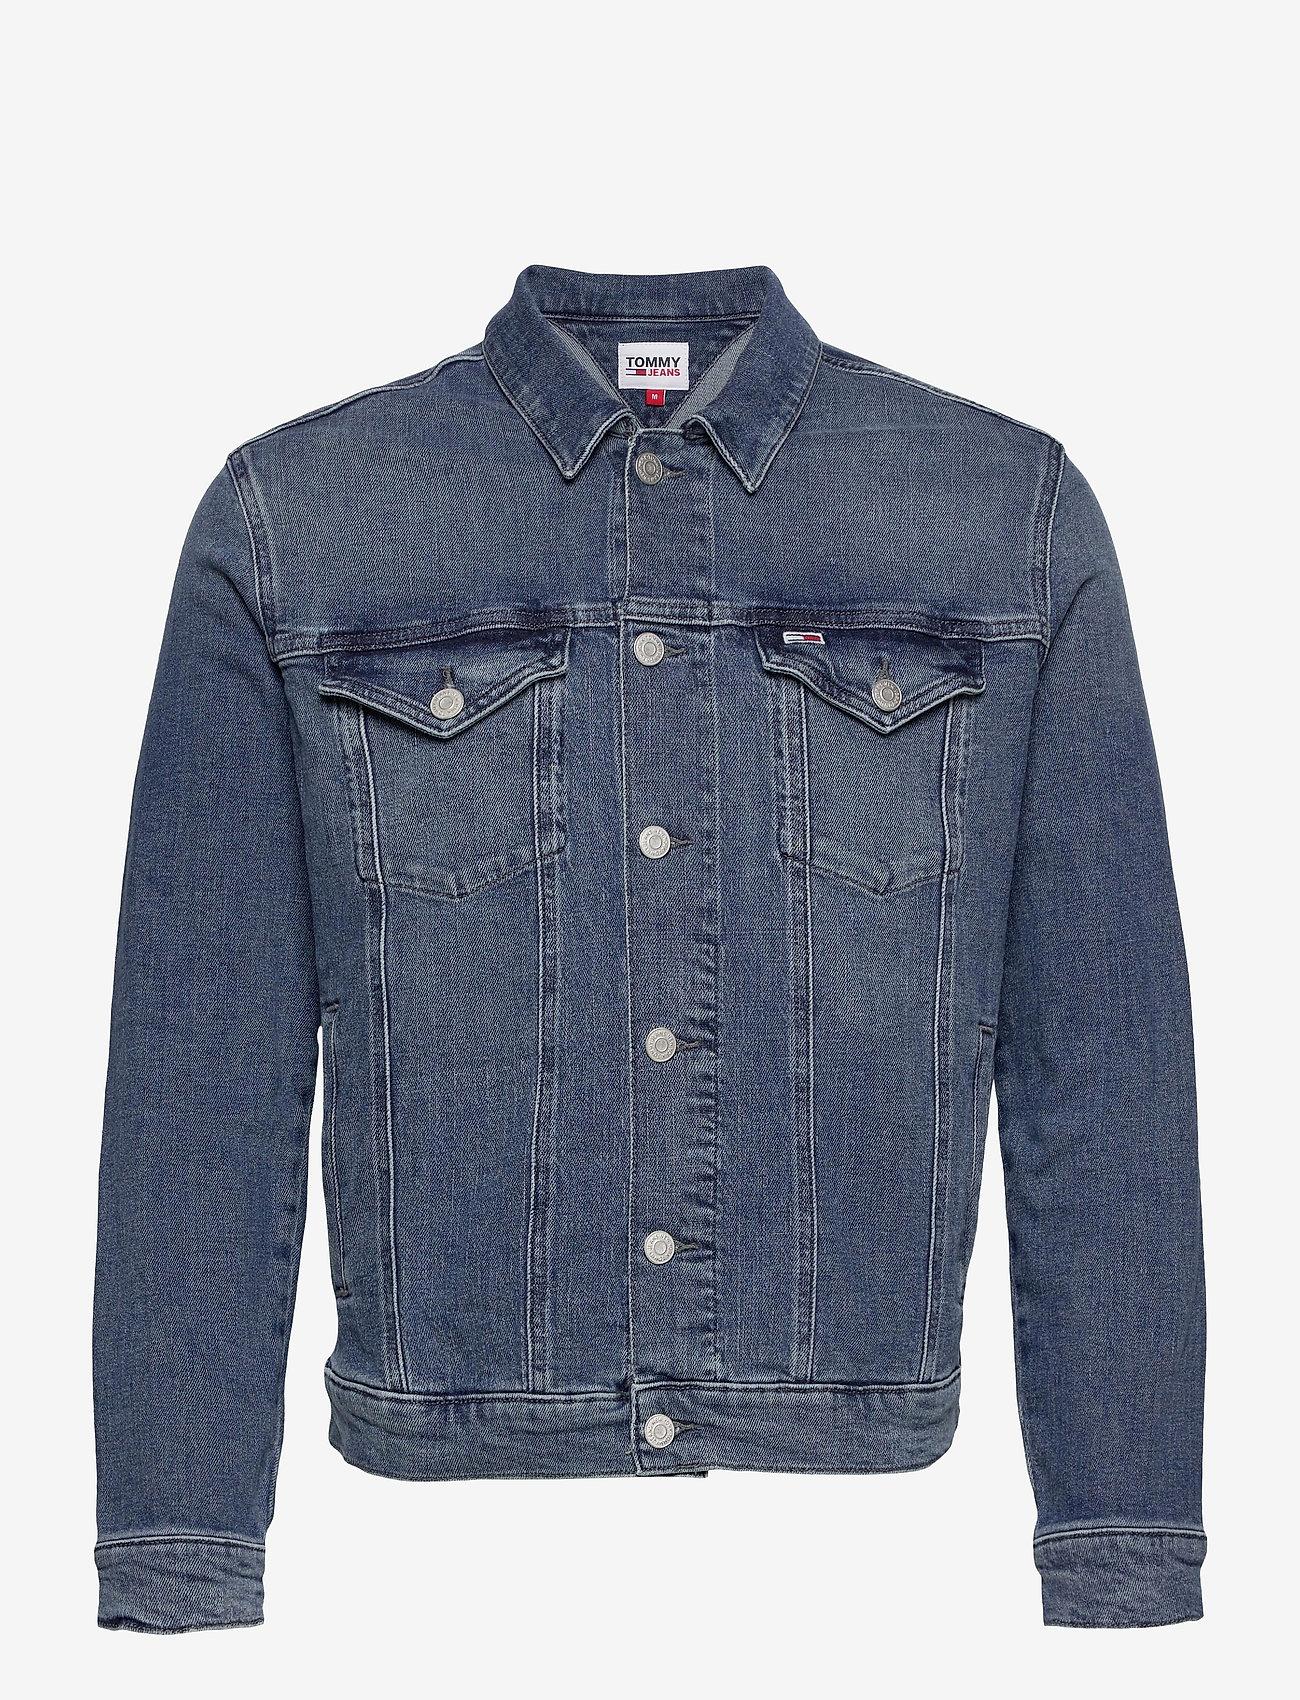 Tommy Jeans - REGULAR TRUCKER JACKET LMBC - jeansjackor - lincoln mb com - 0